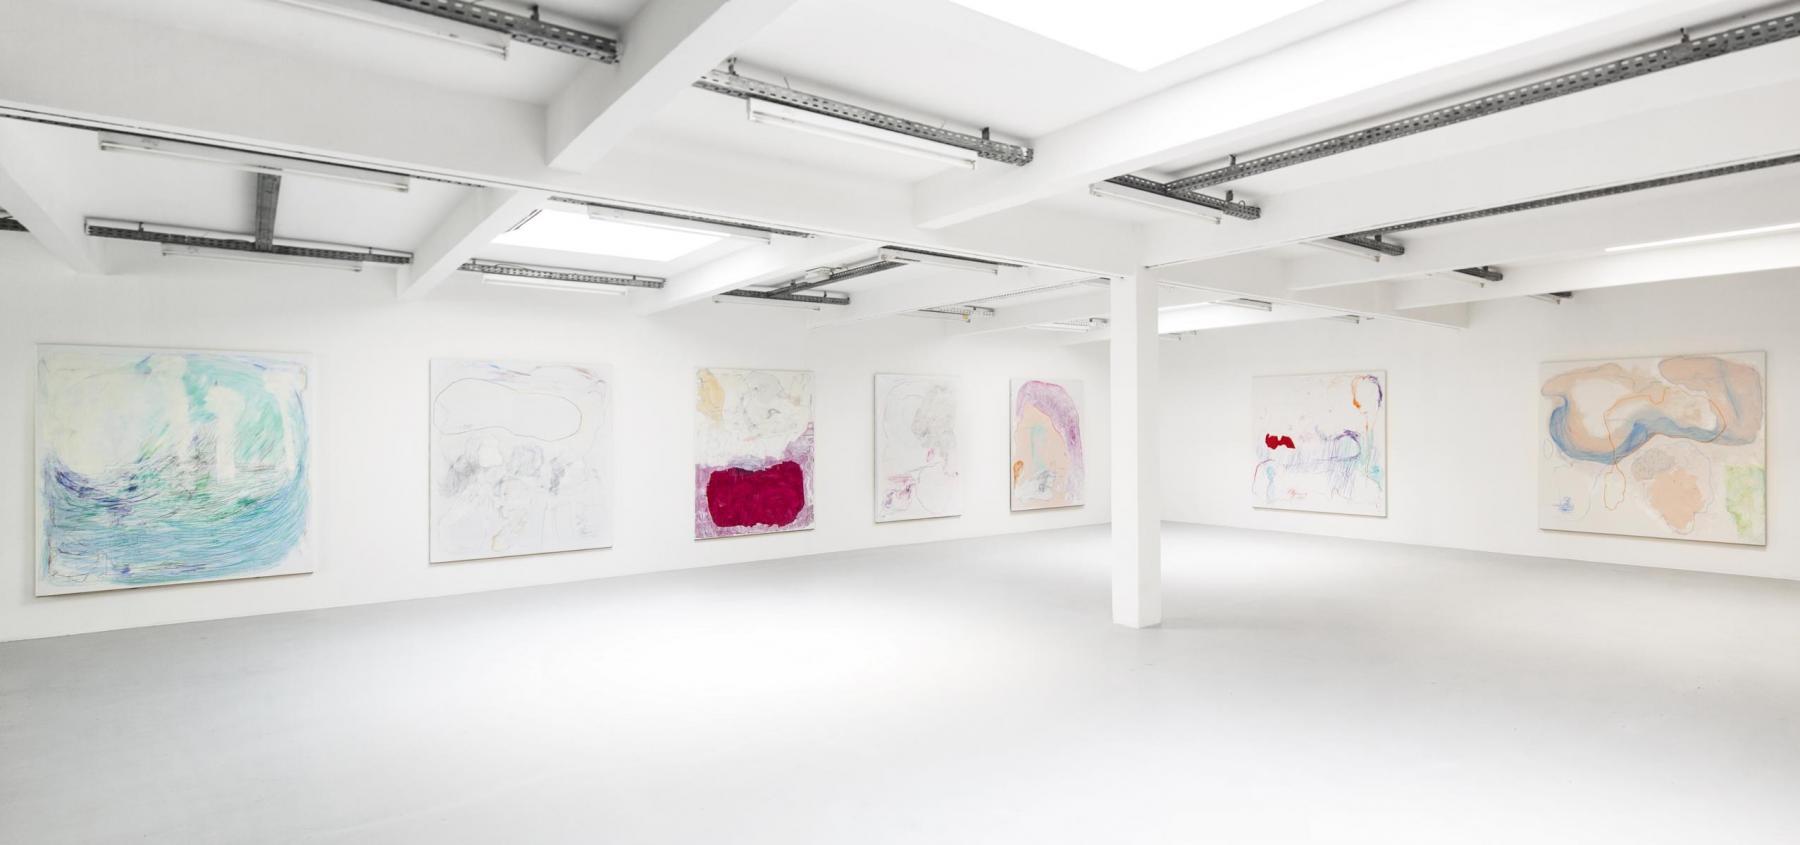 K1600_Mosny_Gonn_2017_Ausstellungsansicht_Verena_Nagl_09